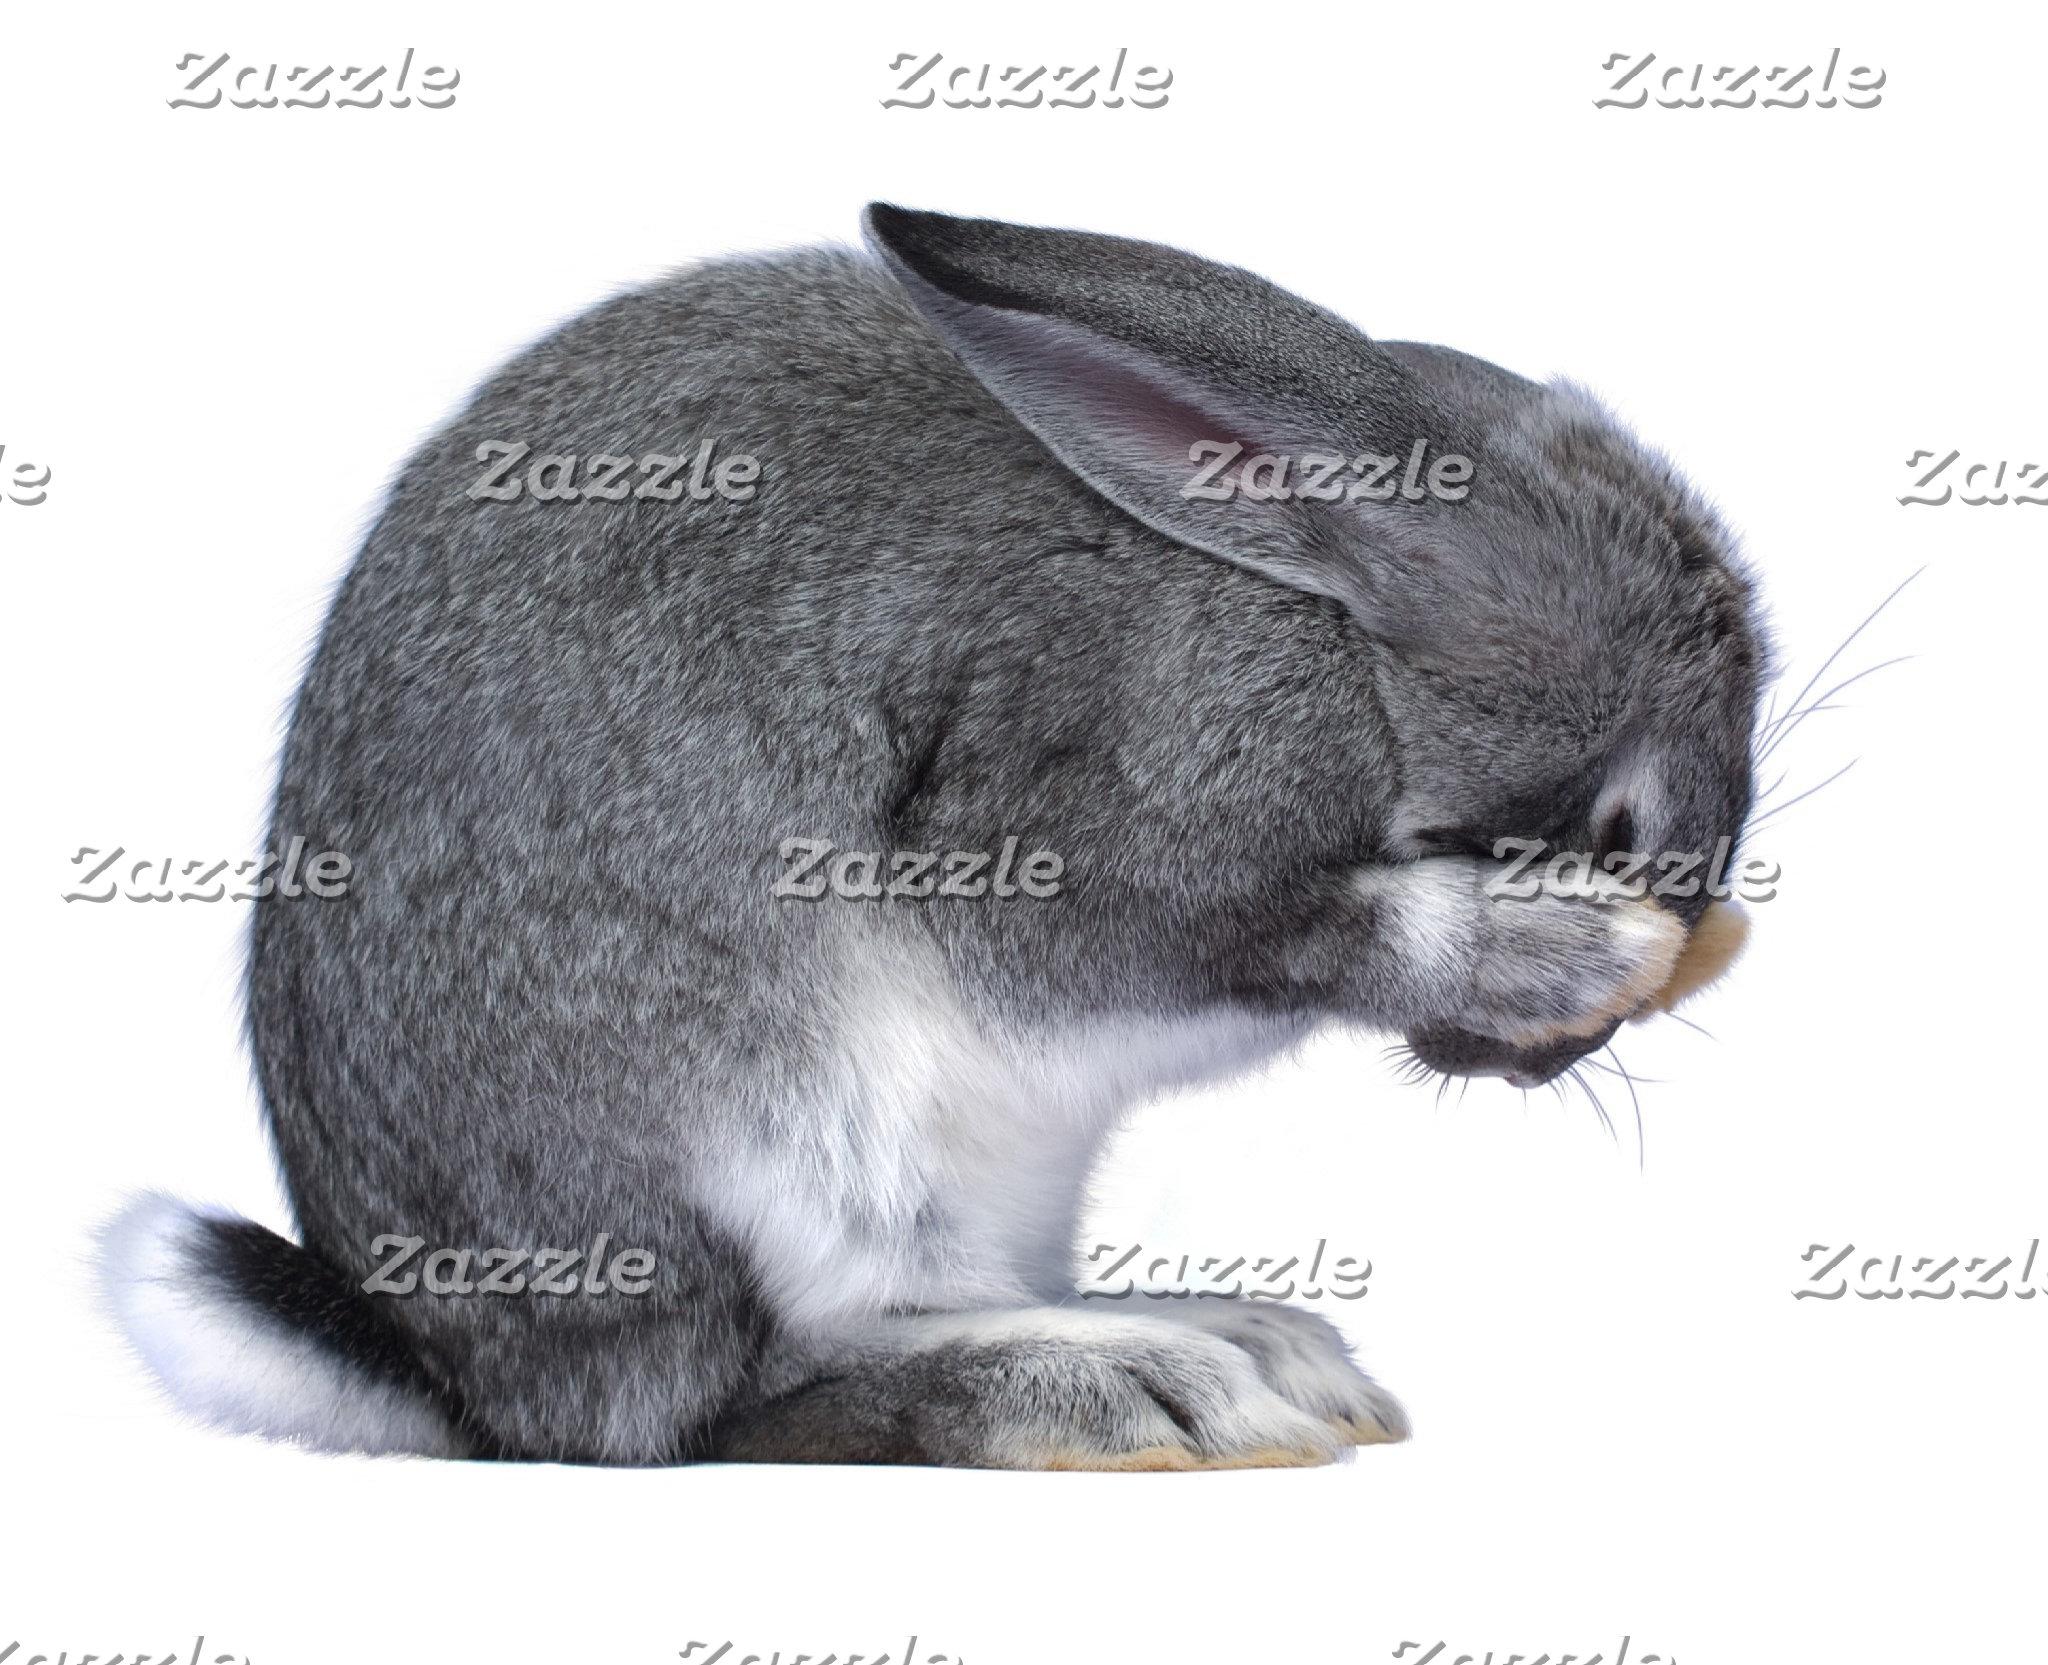 Despairing Rabbit